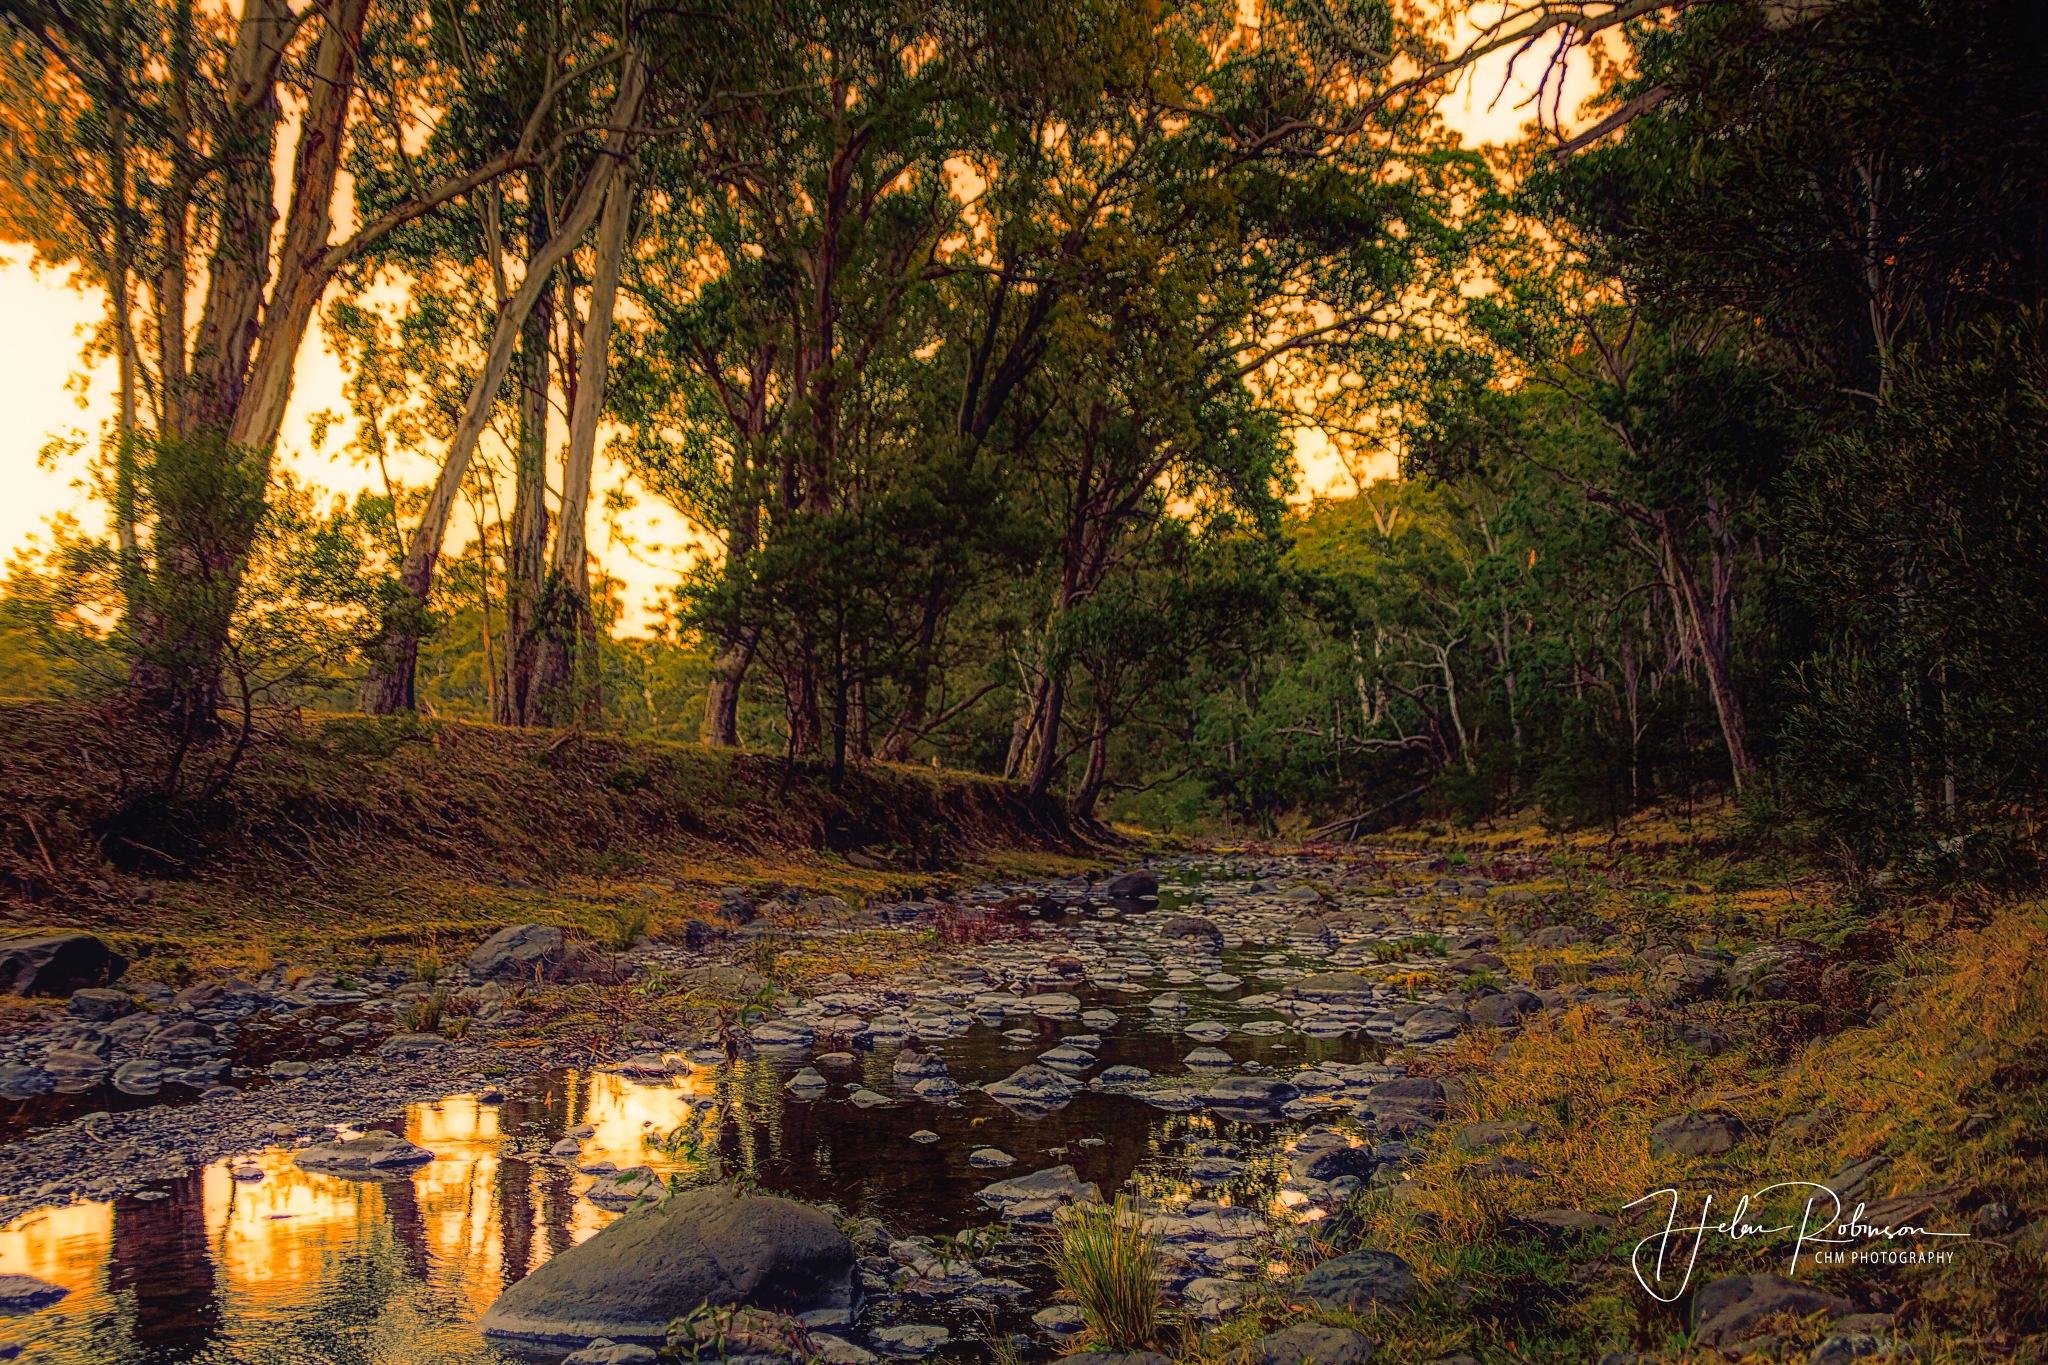 Dalrymple Creek by Helen Robinson